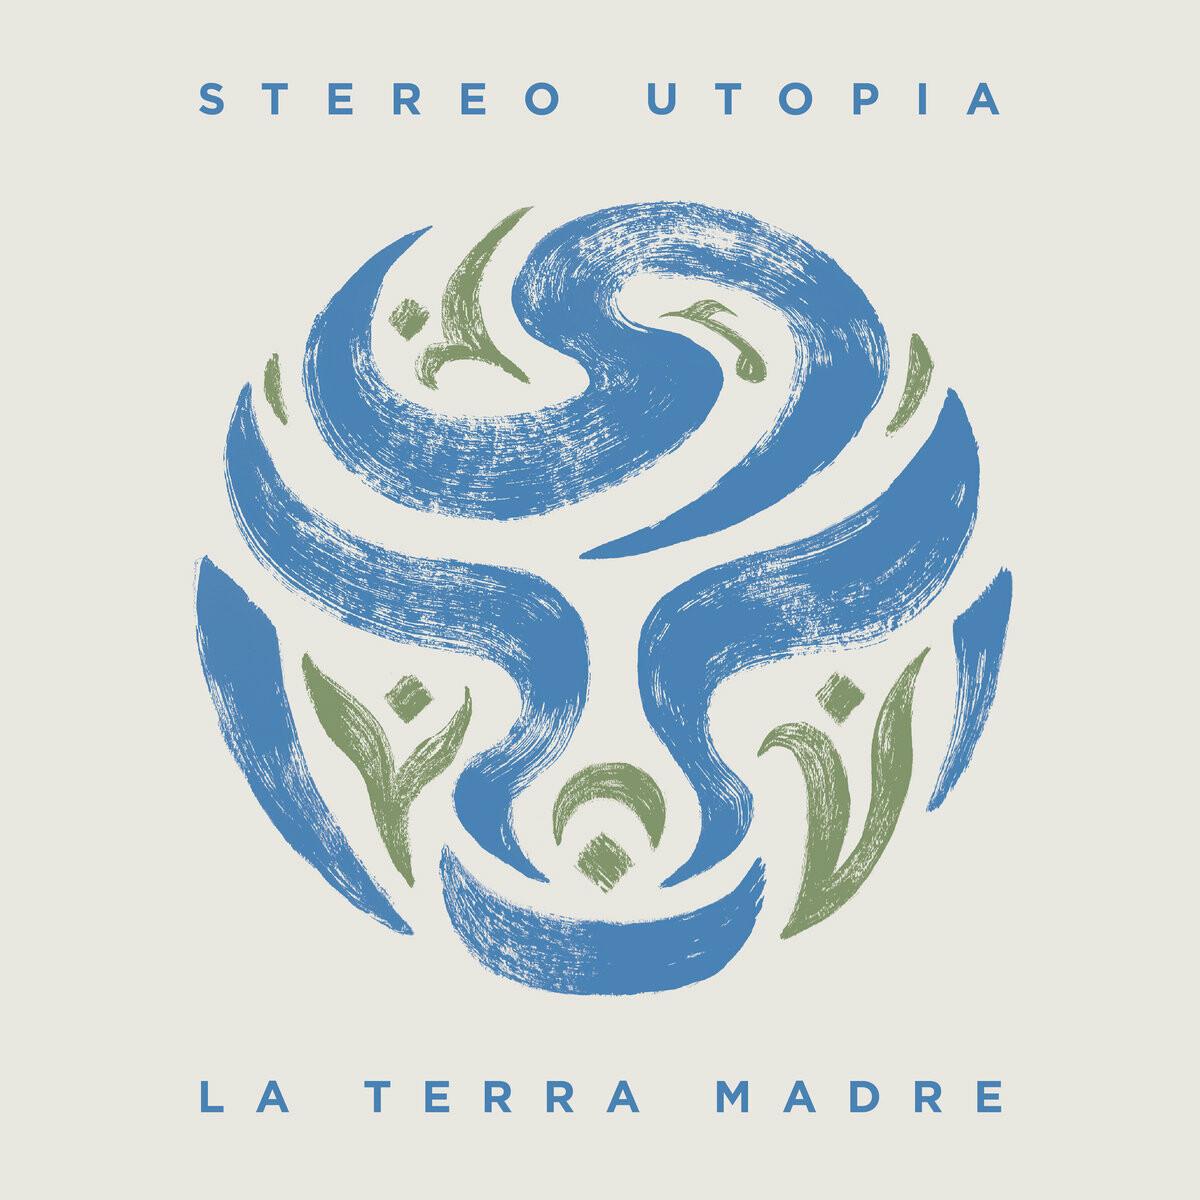 Stereo Utopia- Addis Ababa